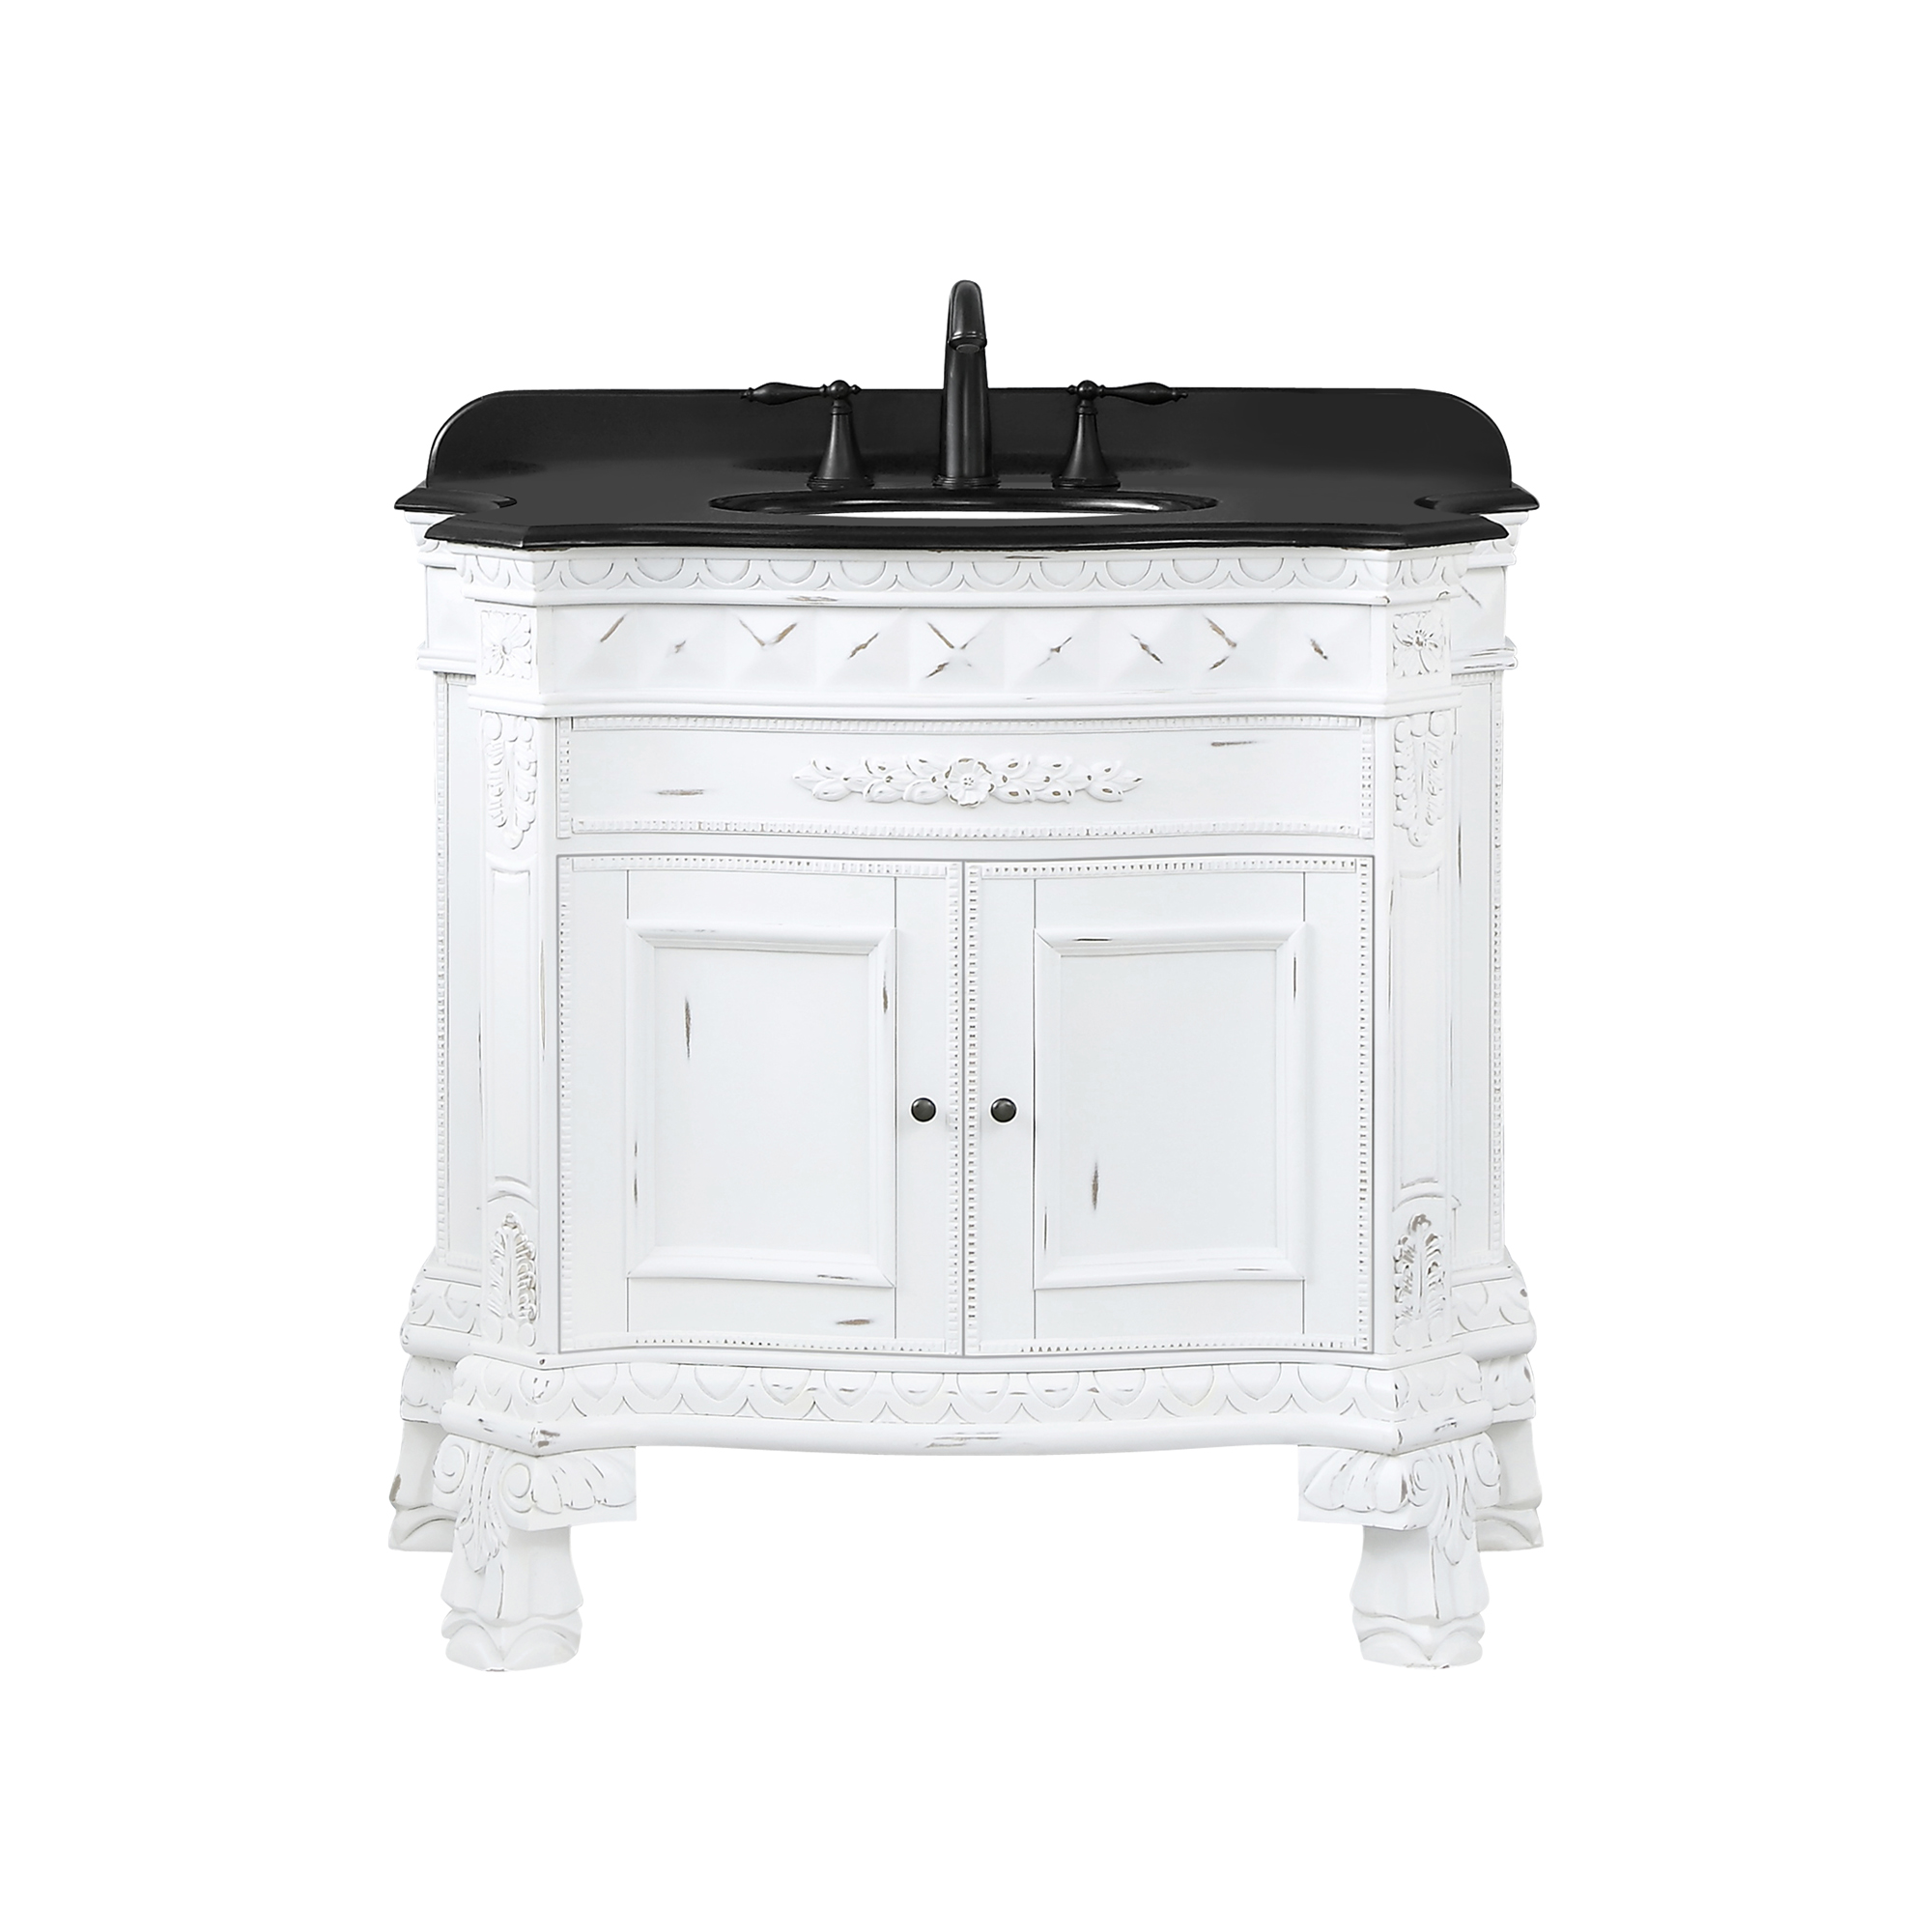 Ove Decors York 36 In Antique White Vanity With Black Granite Top Walmart Com Walmart Com